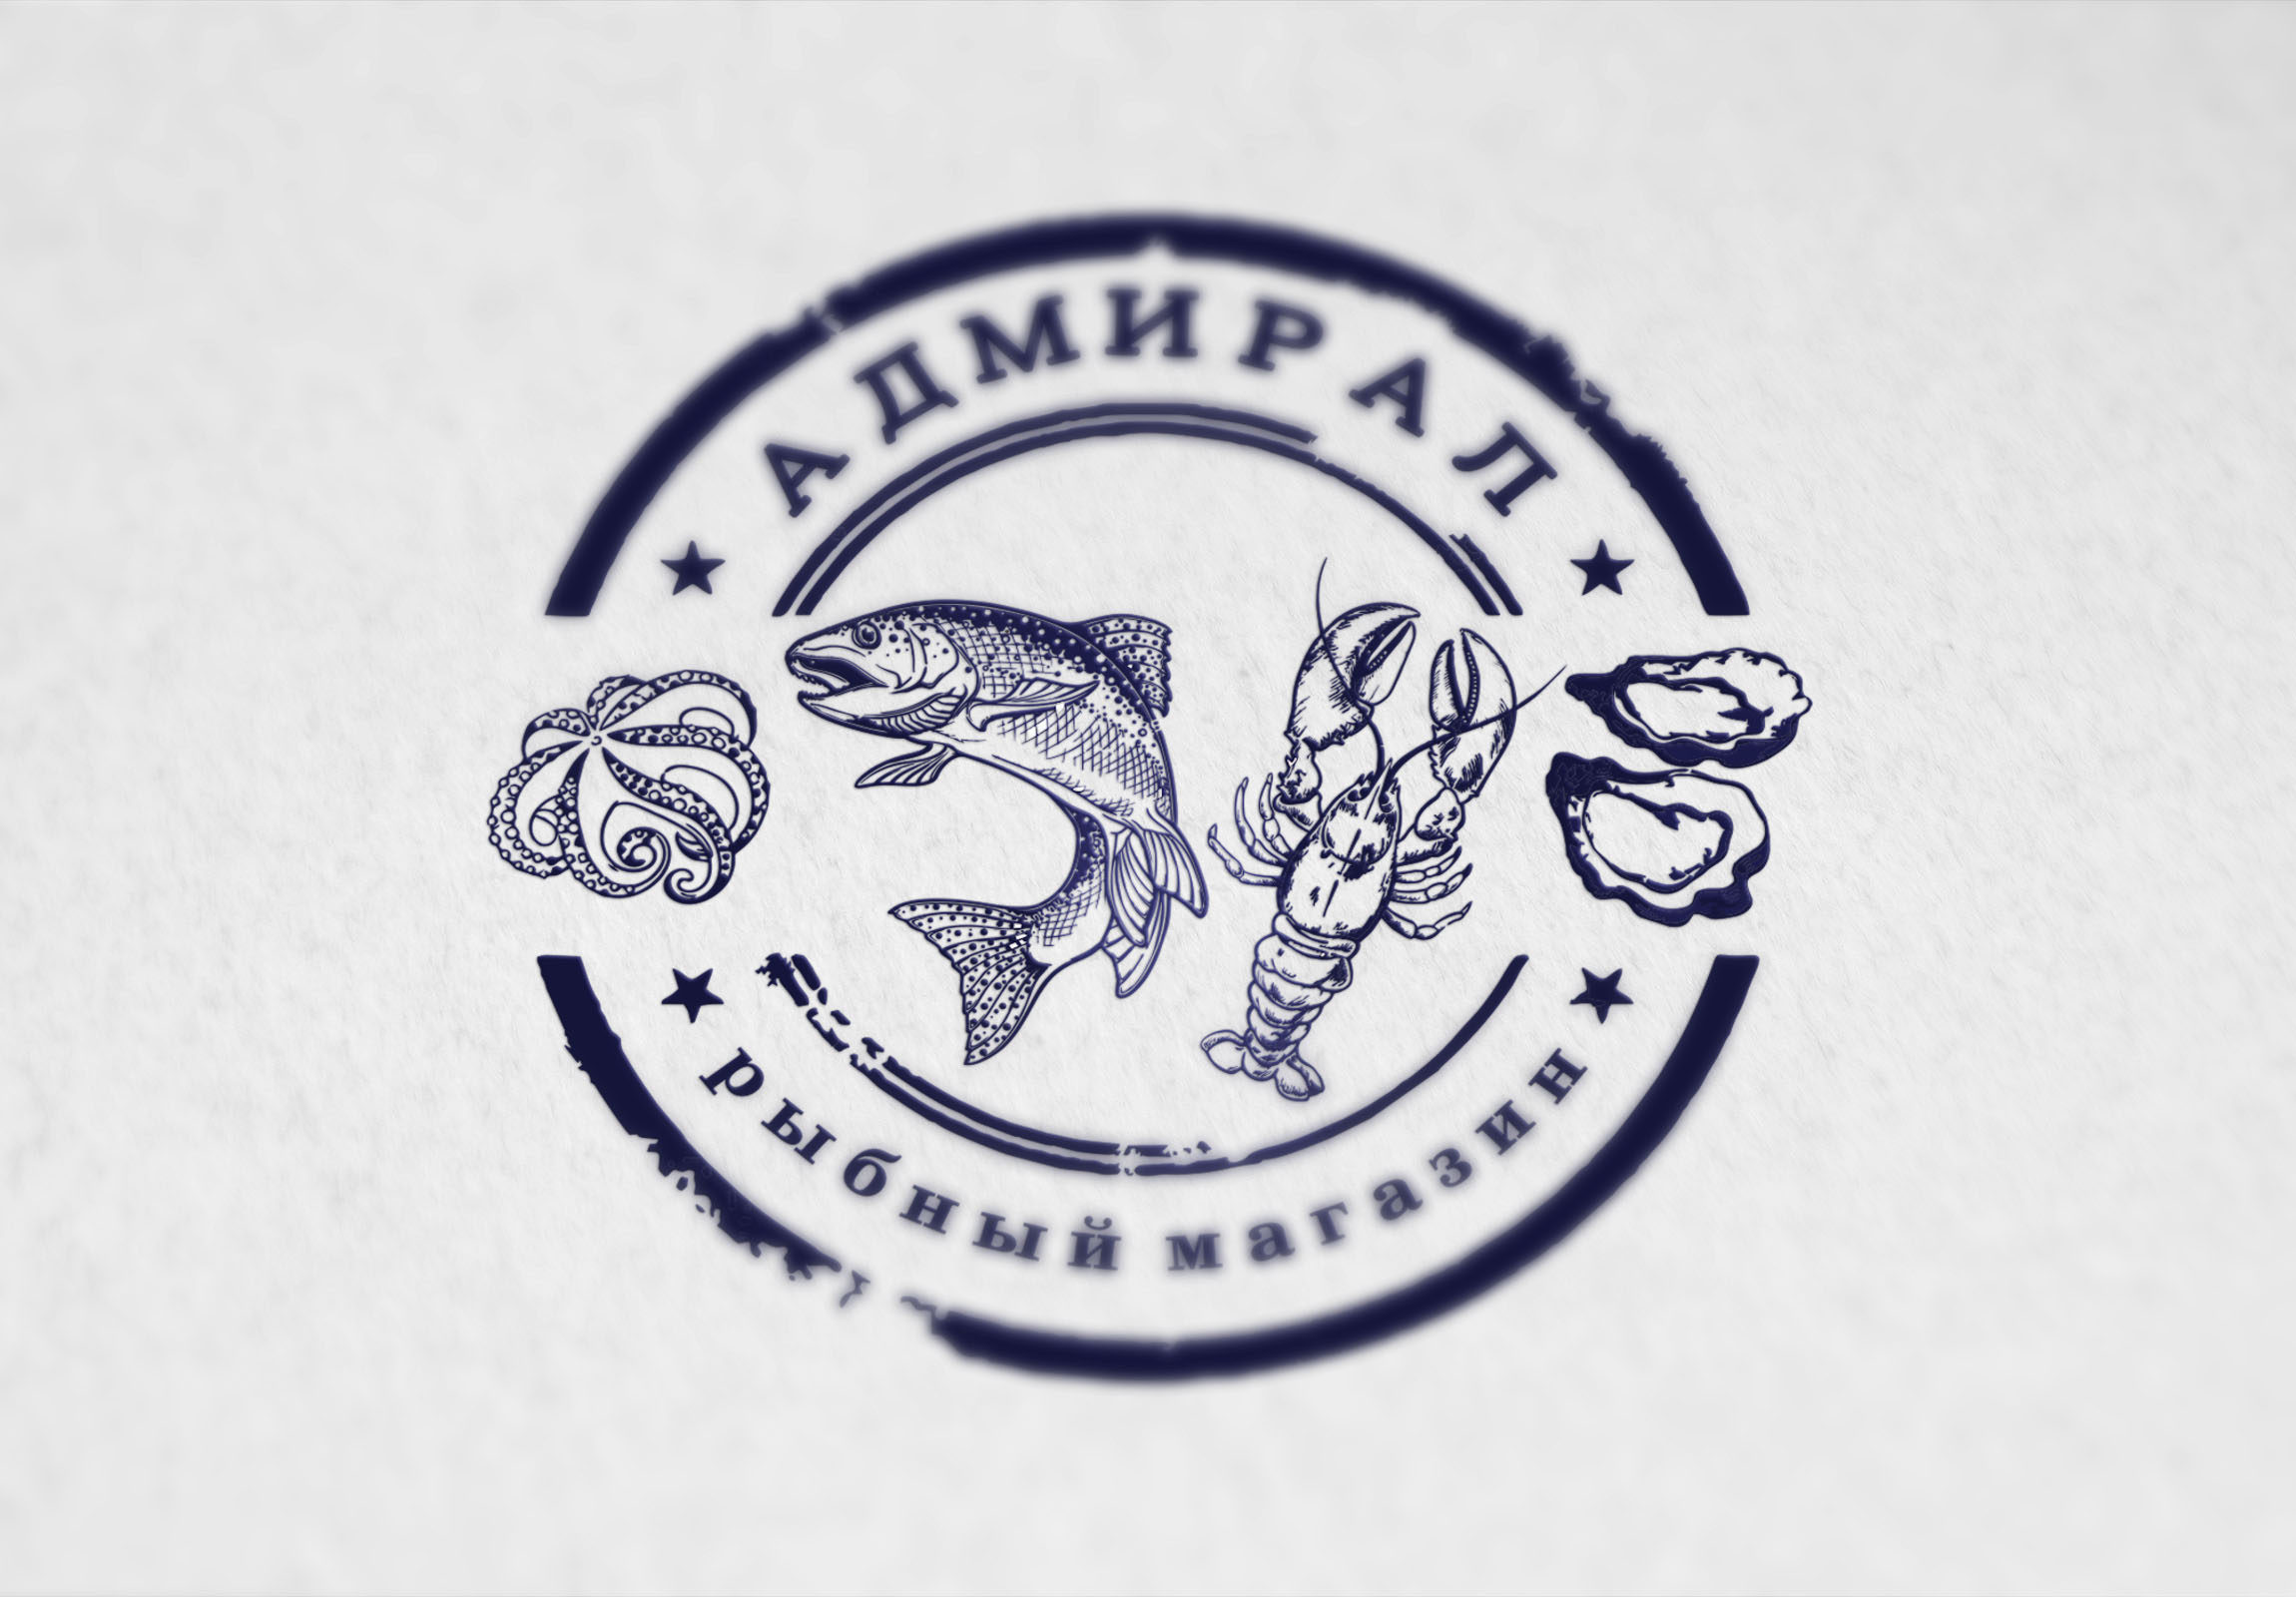 Разработка фирменного стиля для рыбного магазина фото f_4445a0c8ccbd8955.jpg